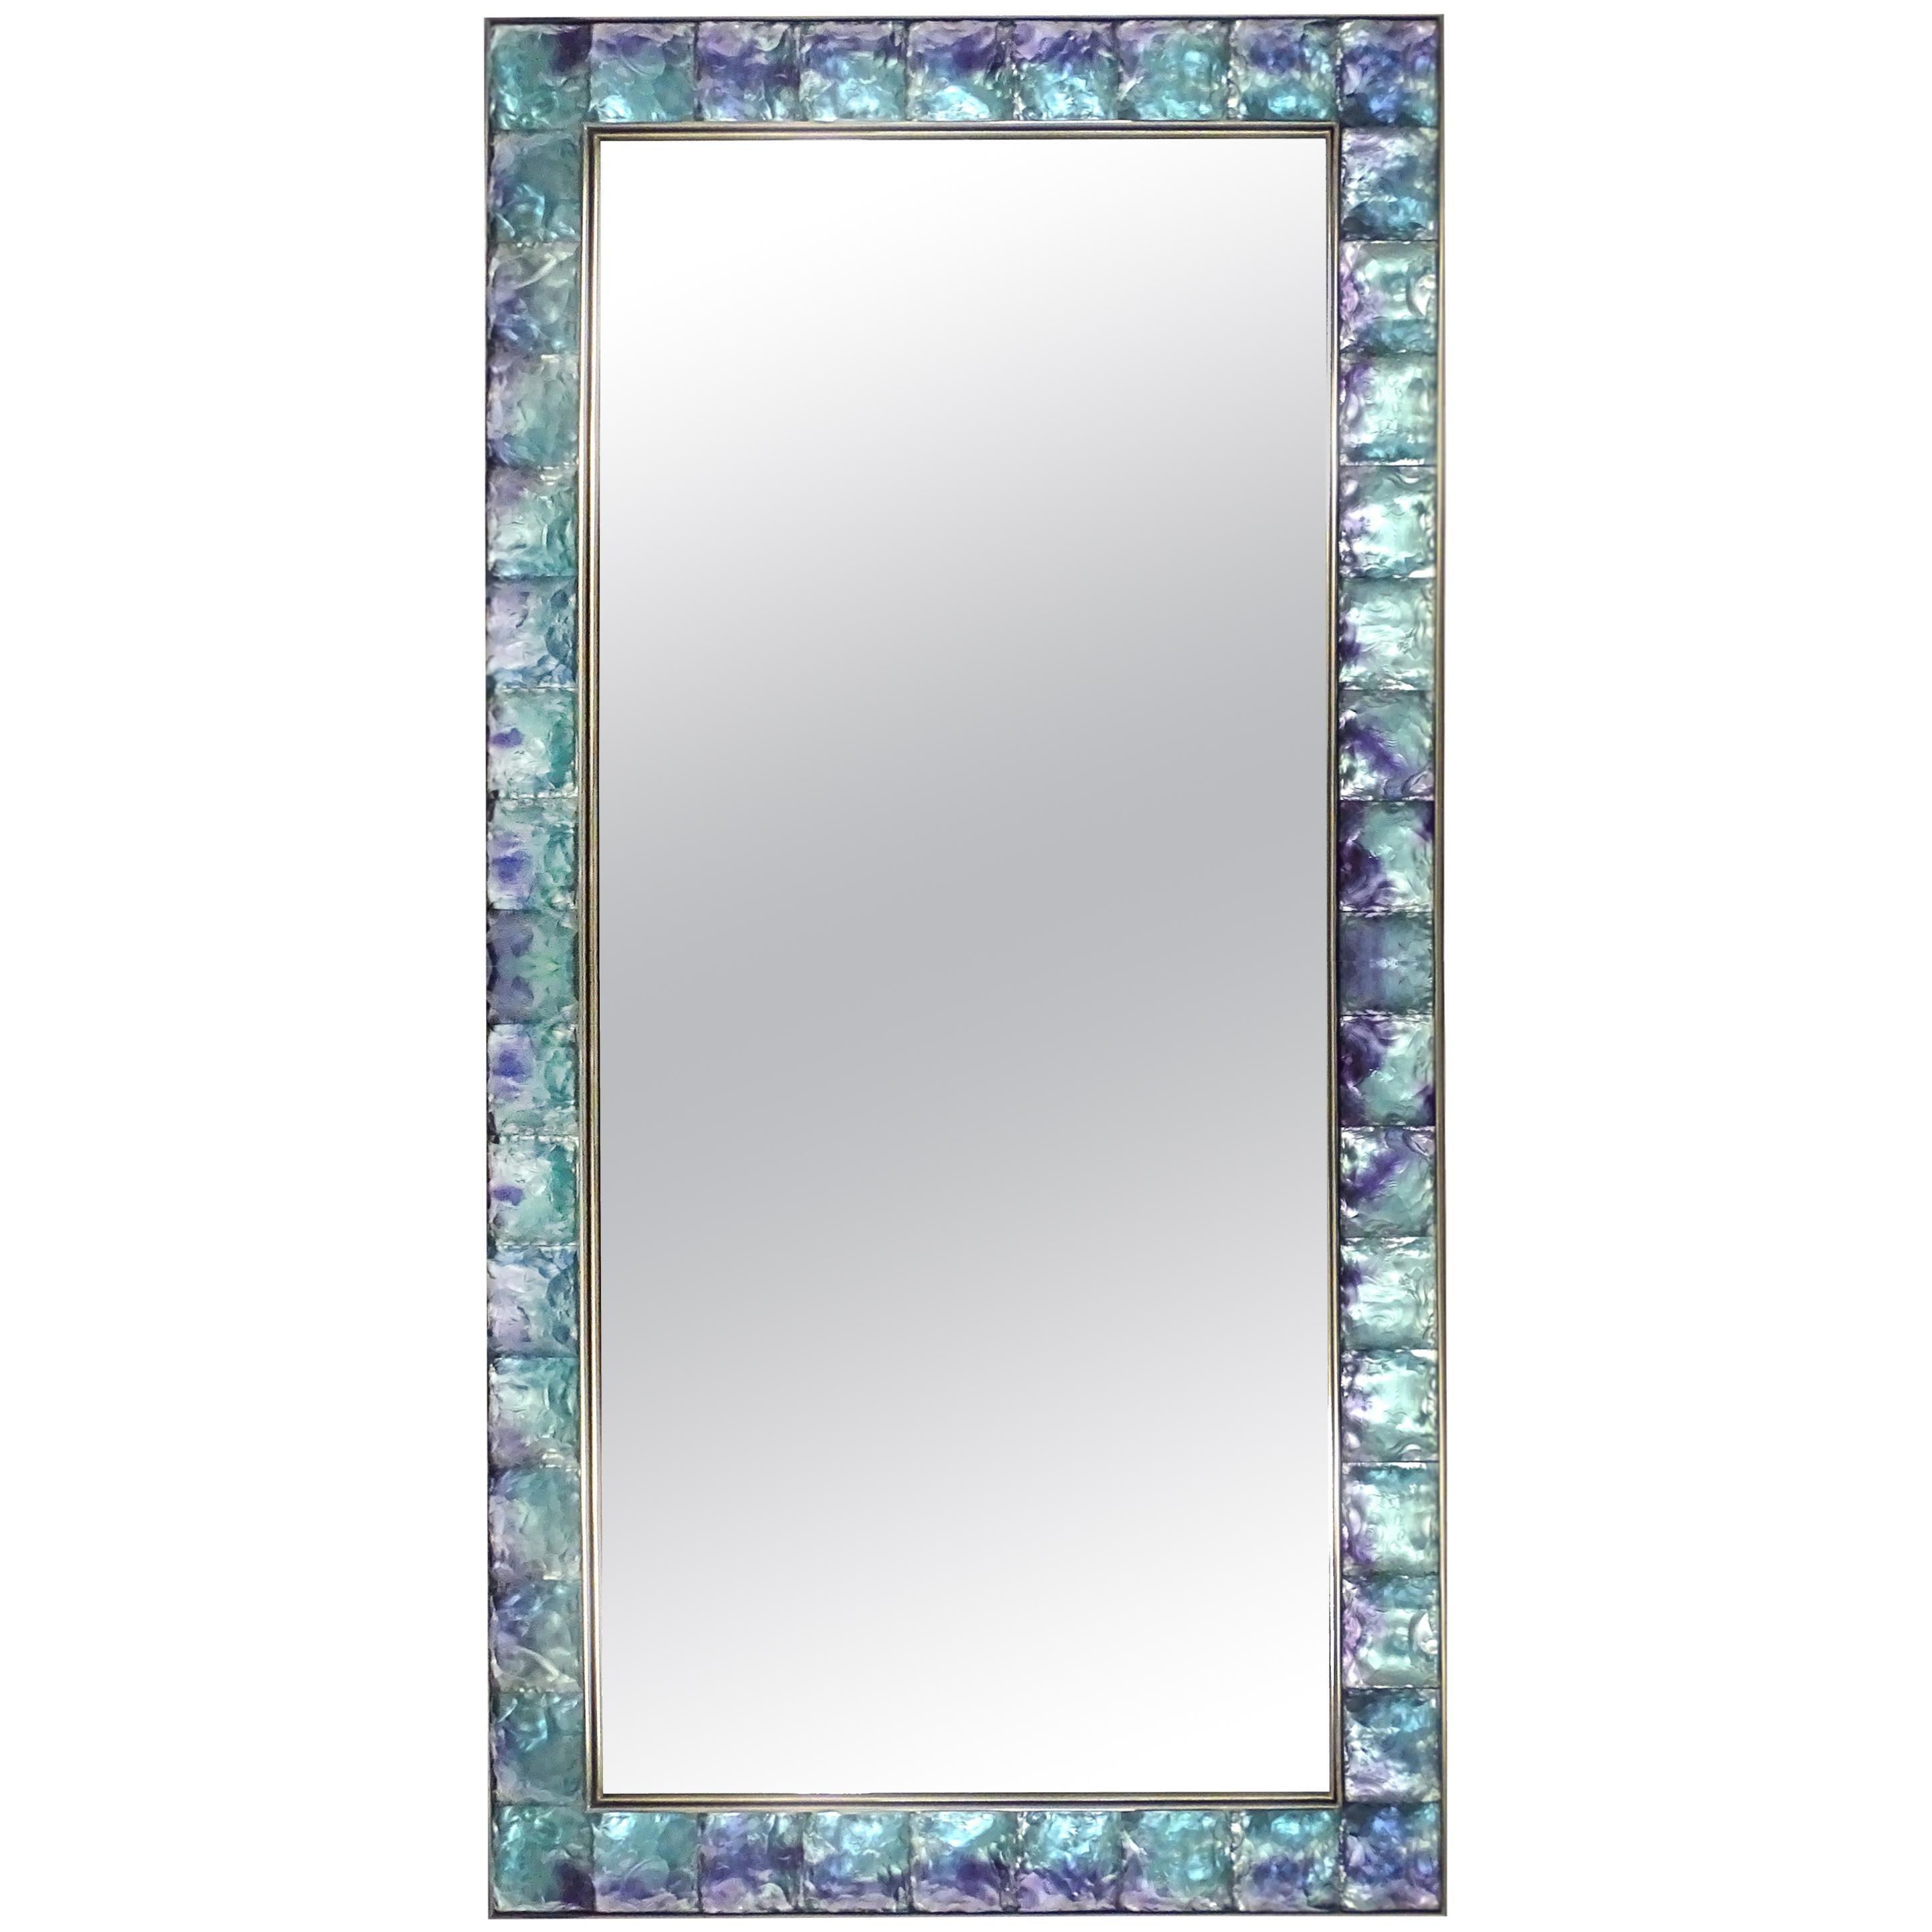 Candy Floor Mirror by Ghirò Studio for Fabio Ltd